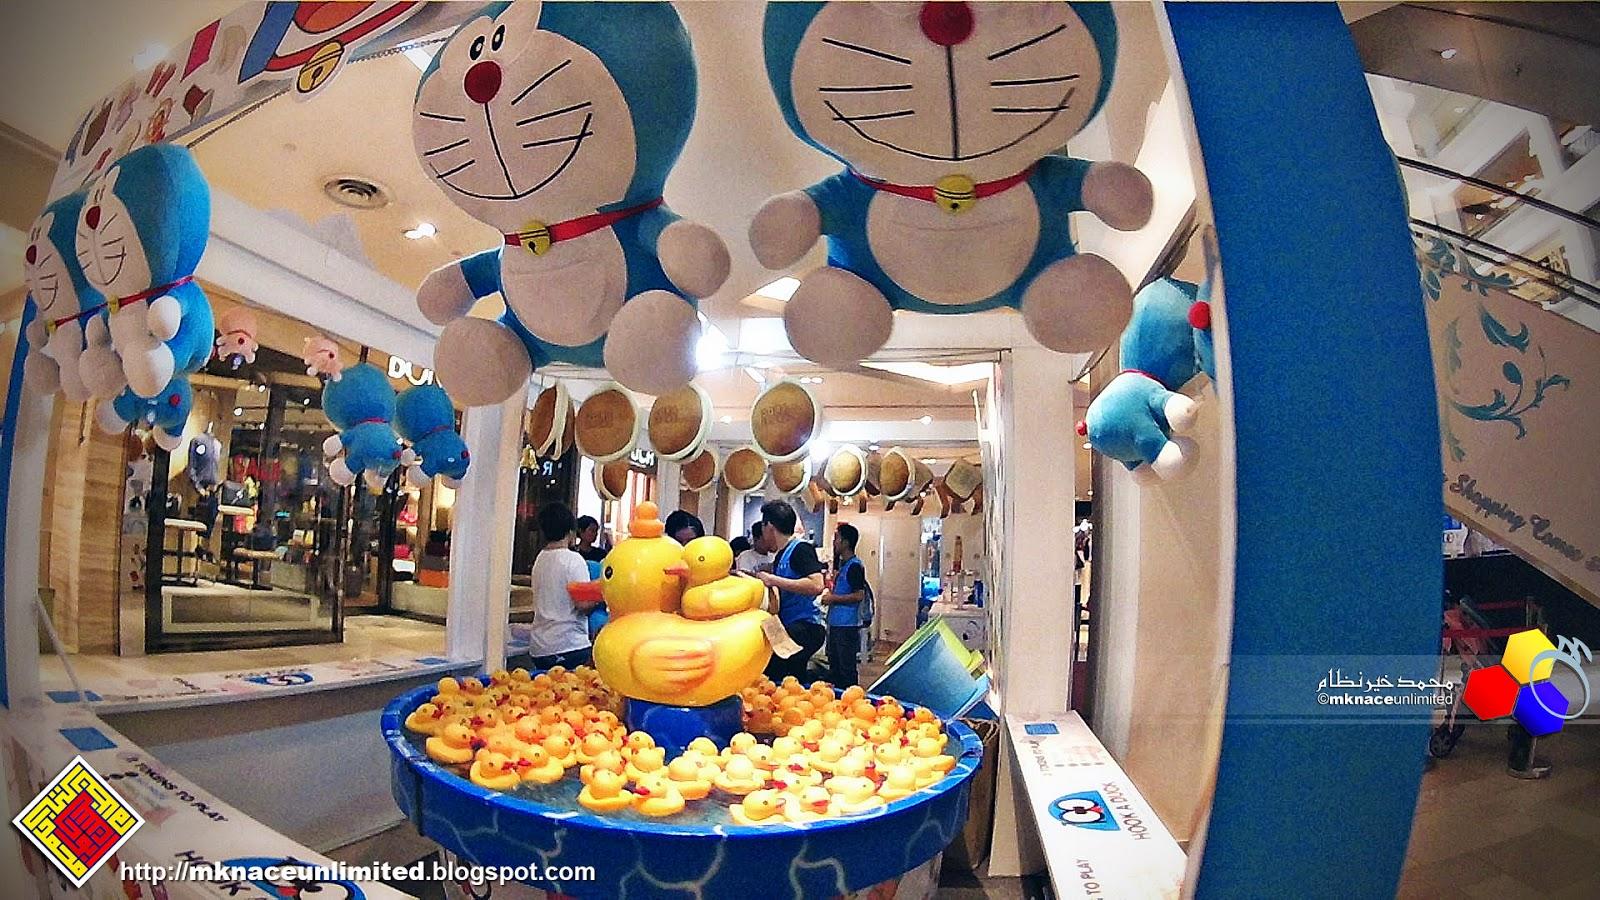 Jalan Cari Pasal Di 100 Doraemon Secret Gadget Expo Jb City Tcash Vaganza 33 Must Try Product Nestle Milo Energy Cubes 50 Pcs More Game At The Outside